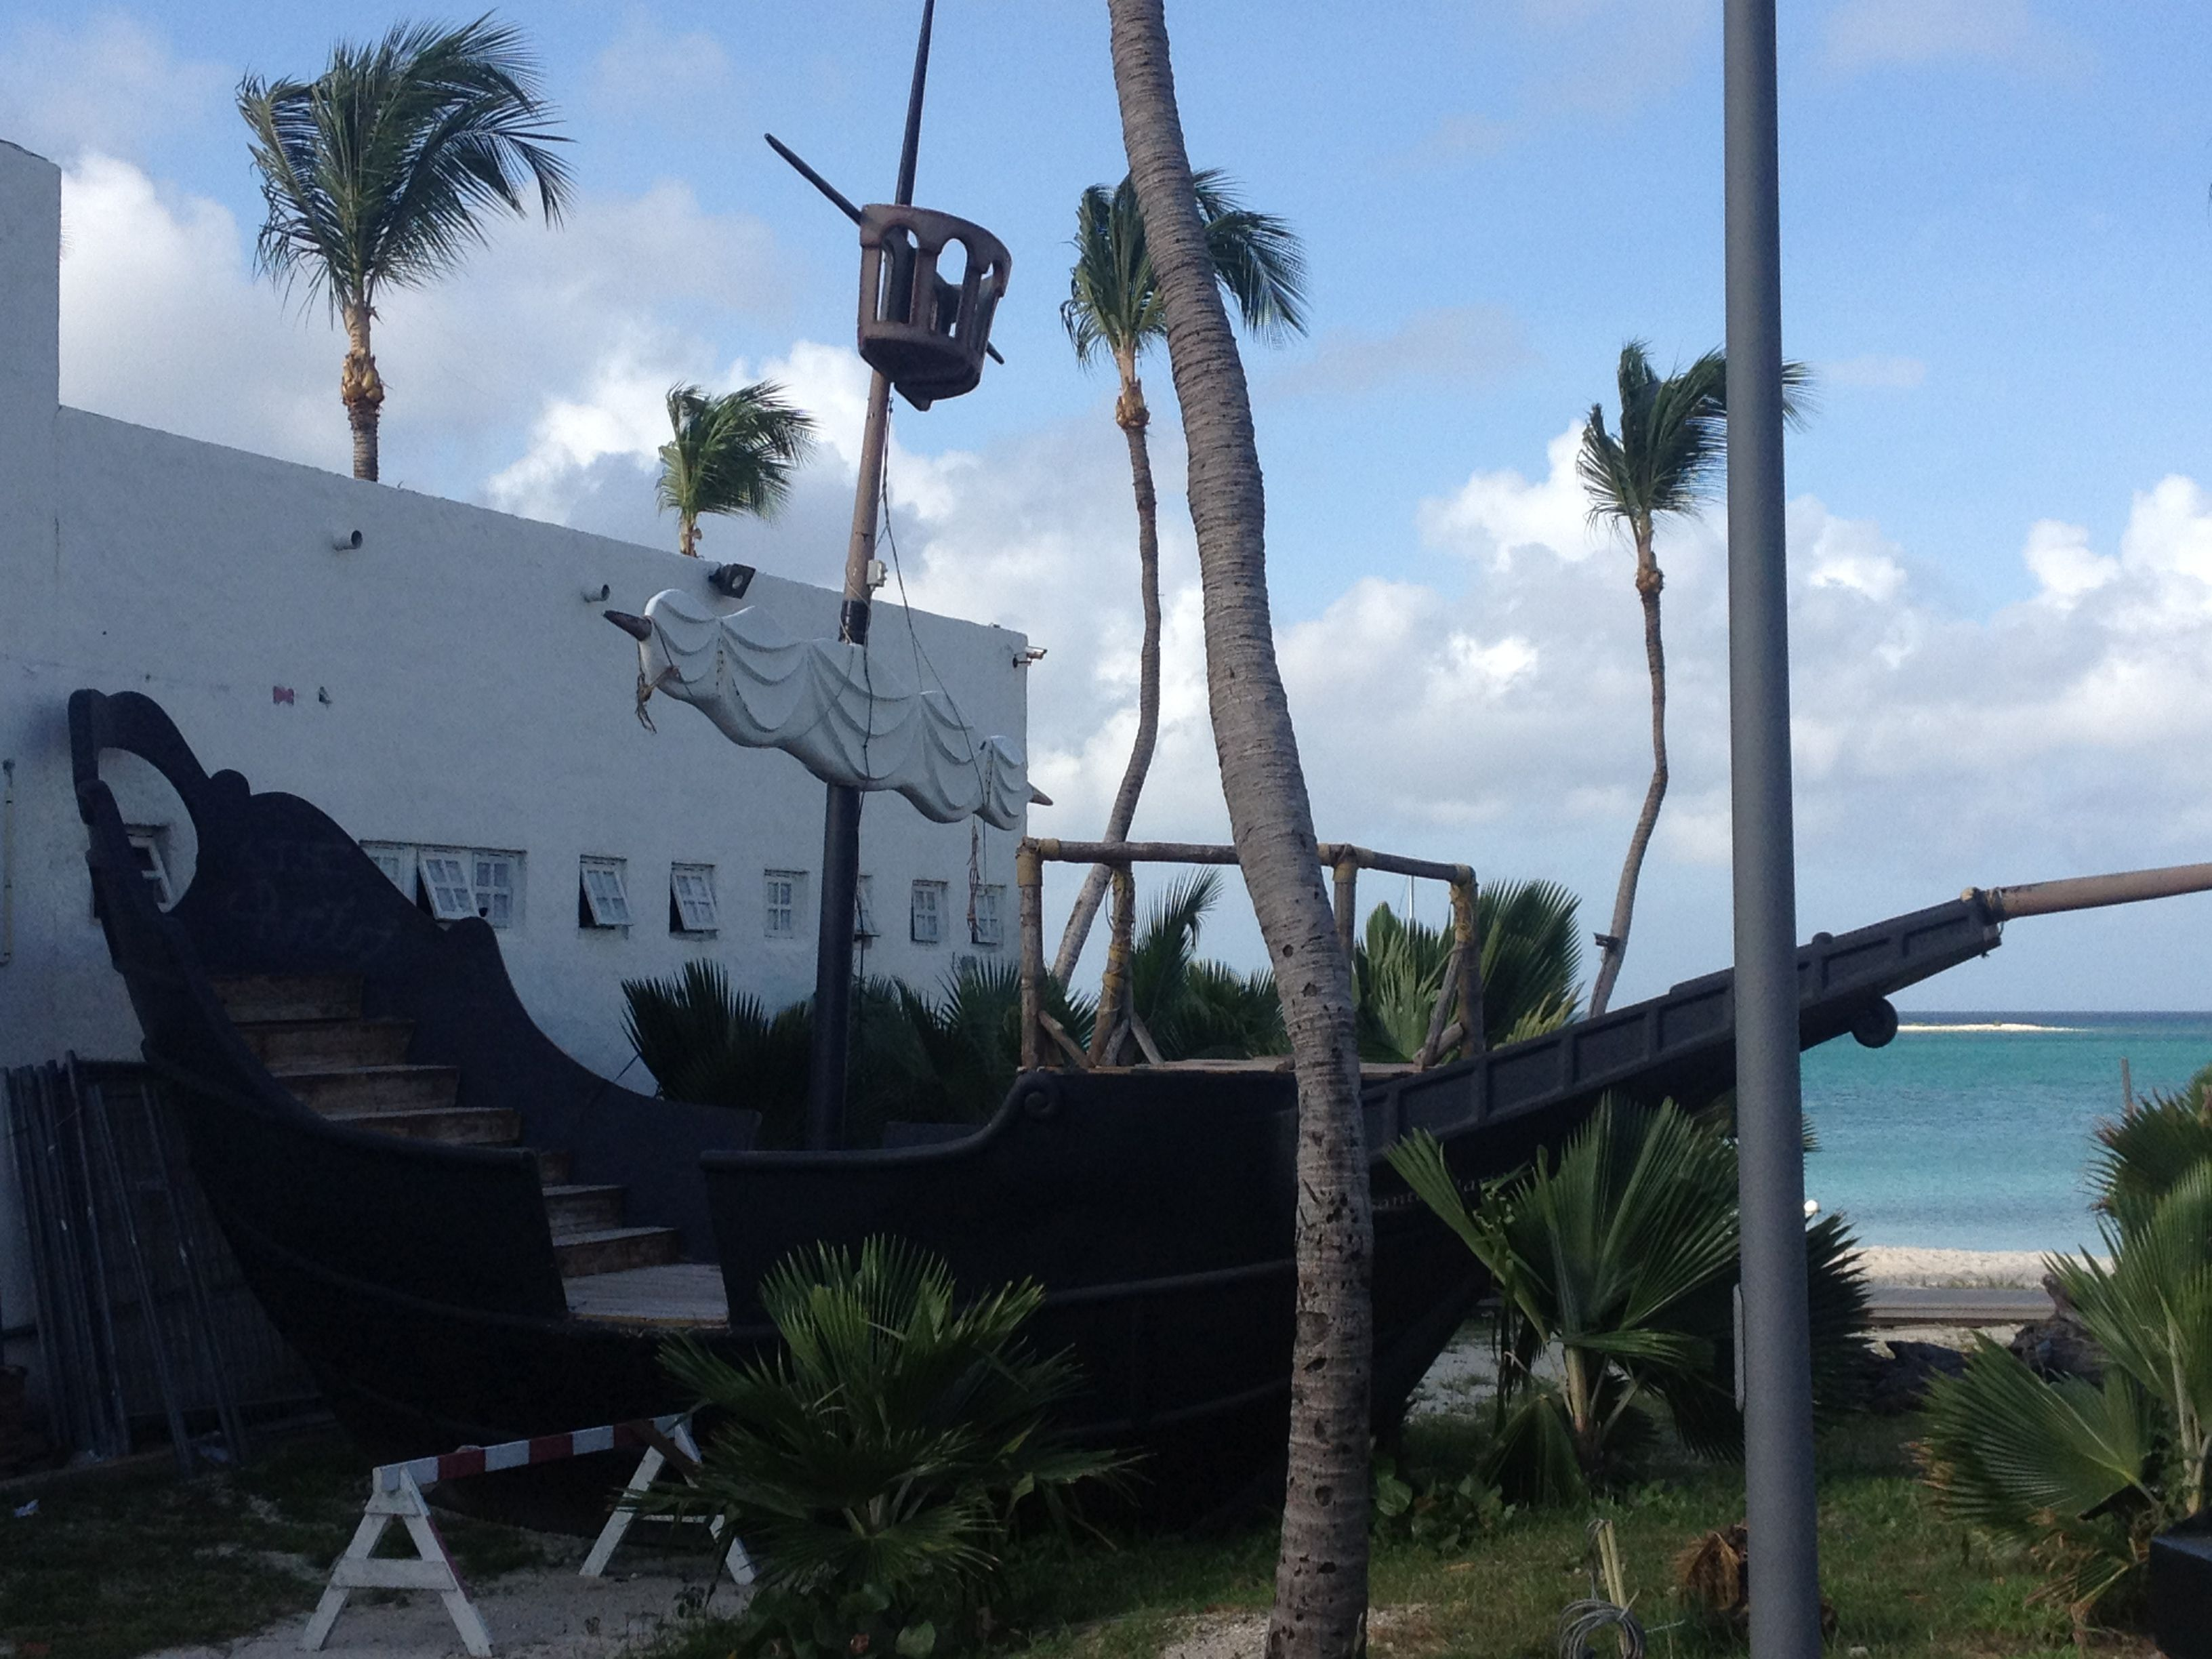 Nikki Beach Aruba Pic 4